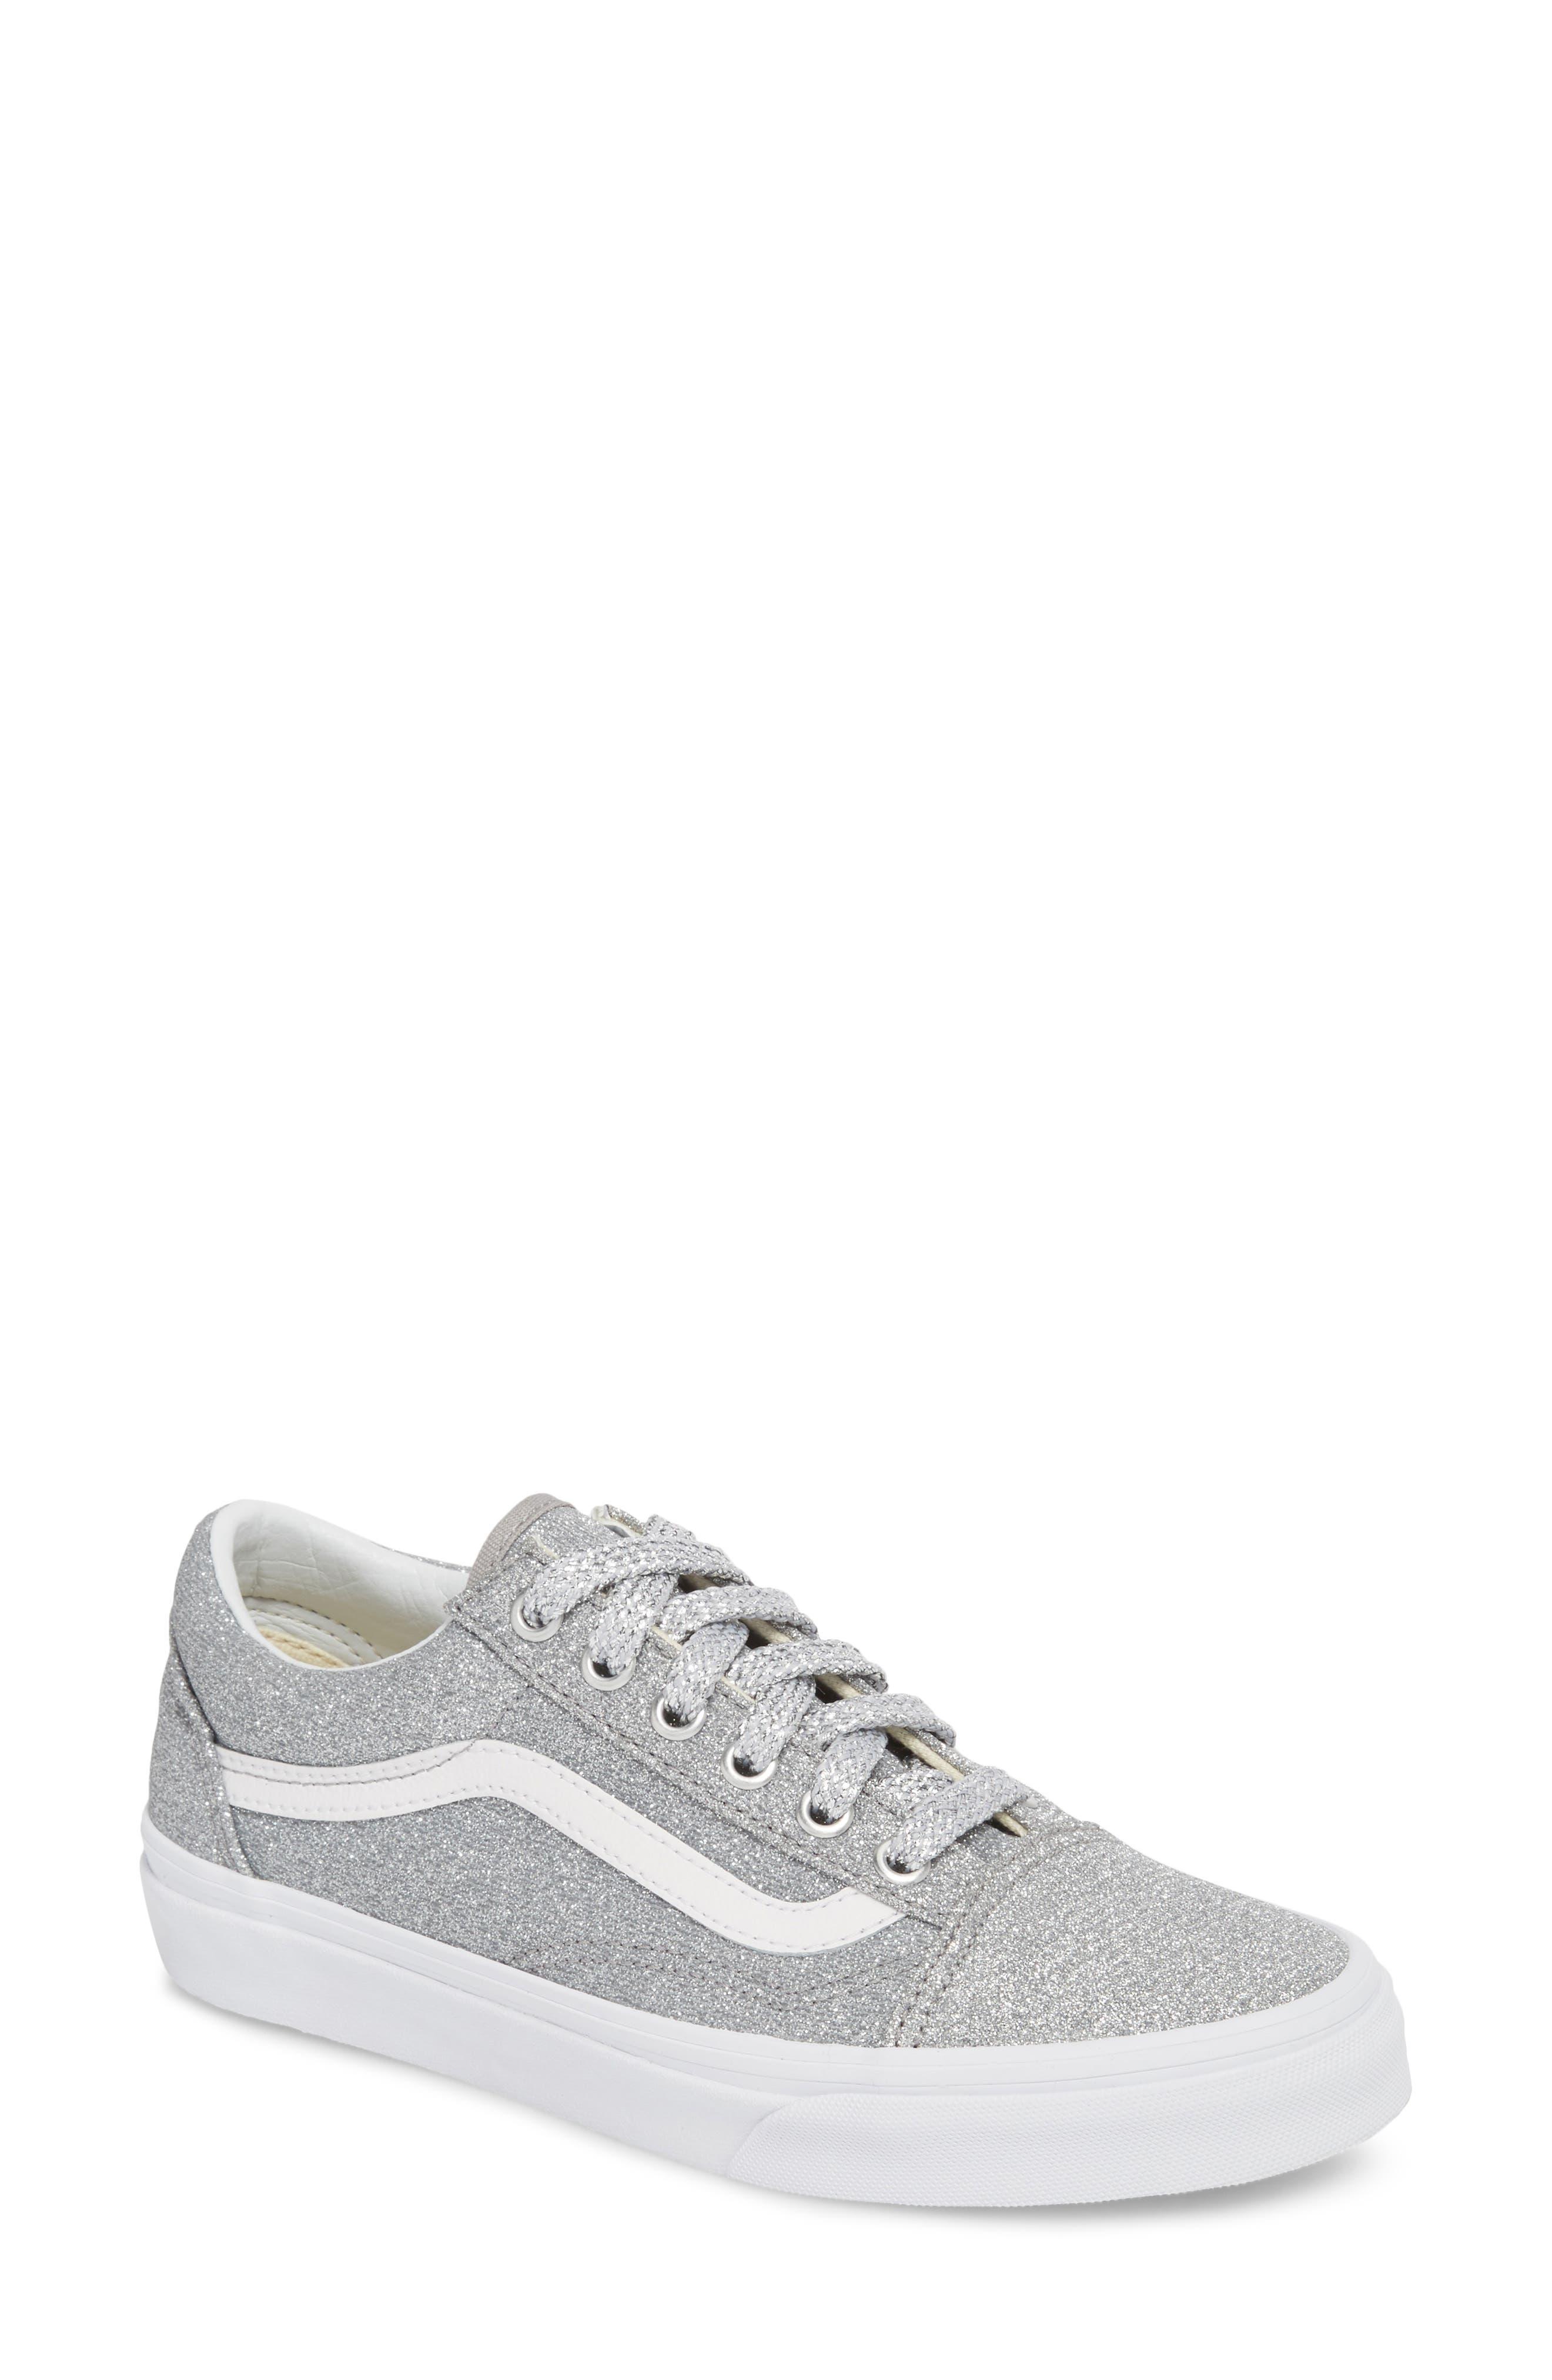 UA Old Skool Glitter Low Top Sneaker,                         Main,                         color, SILVER/ TRUE WHITE GLITTER